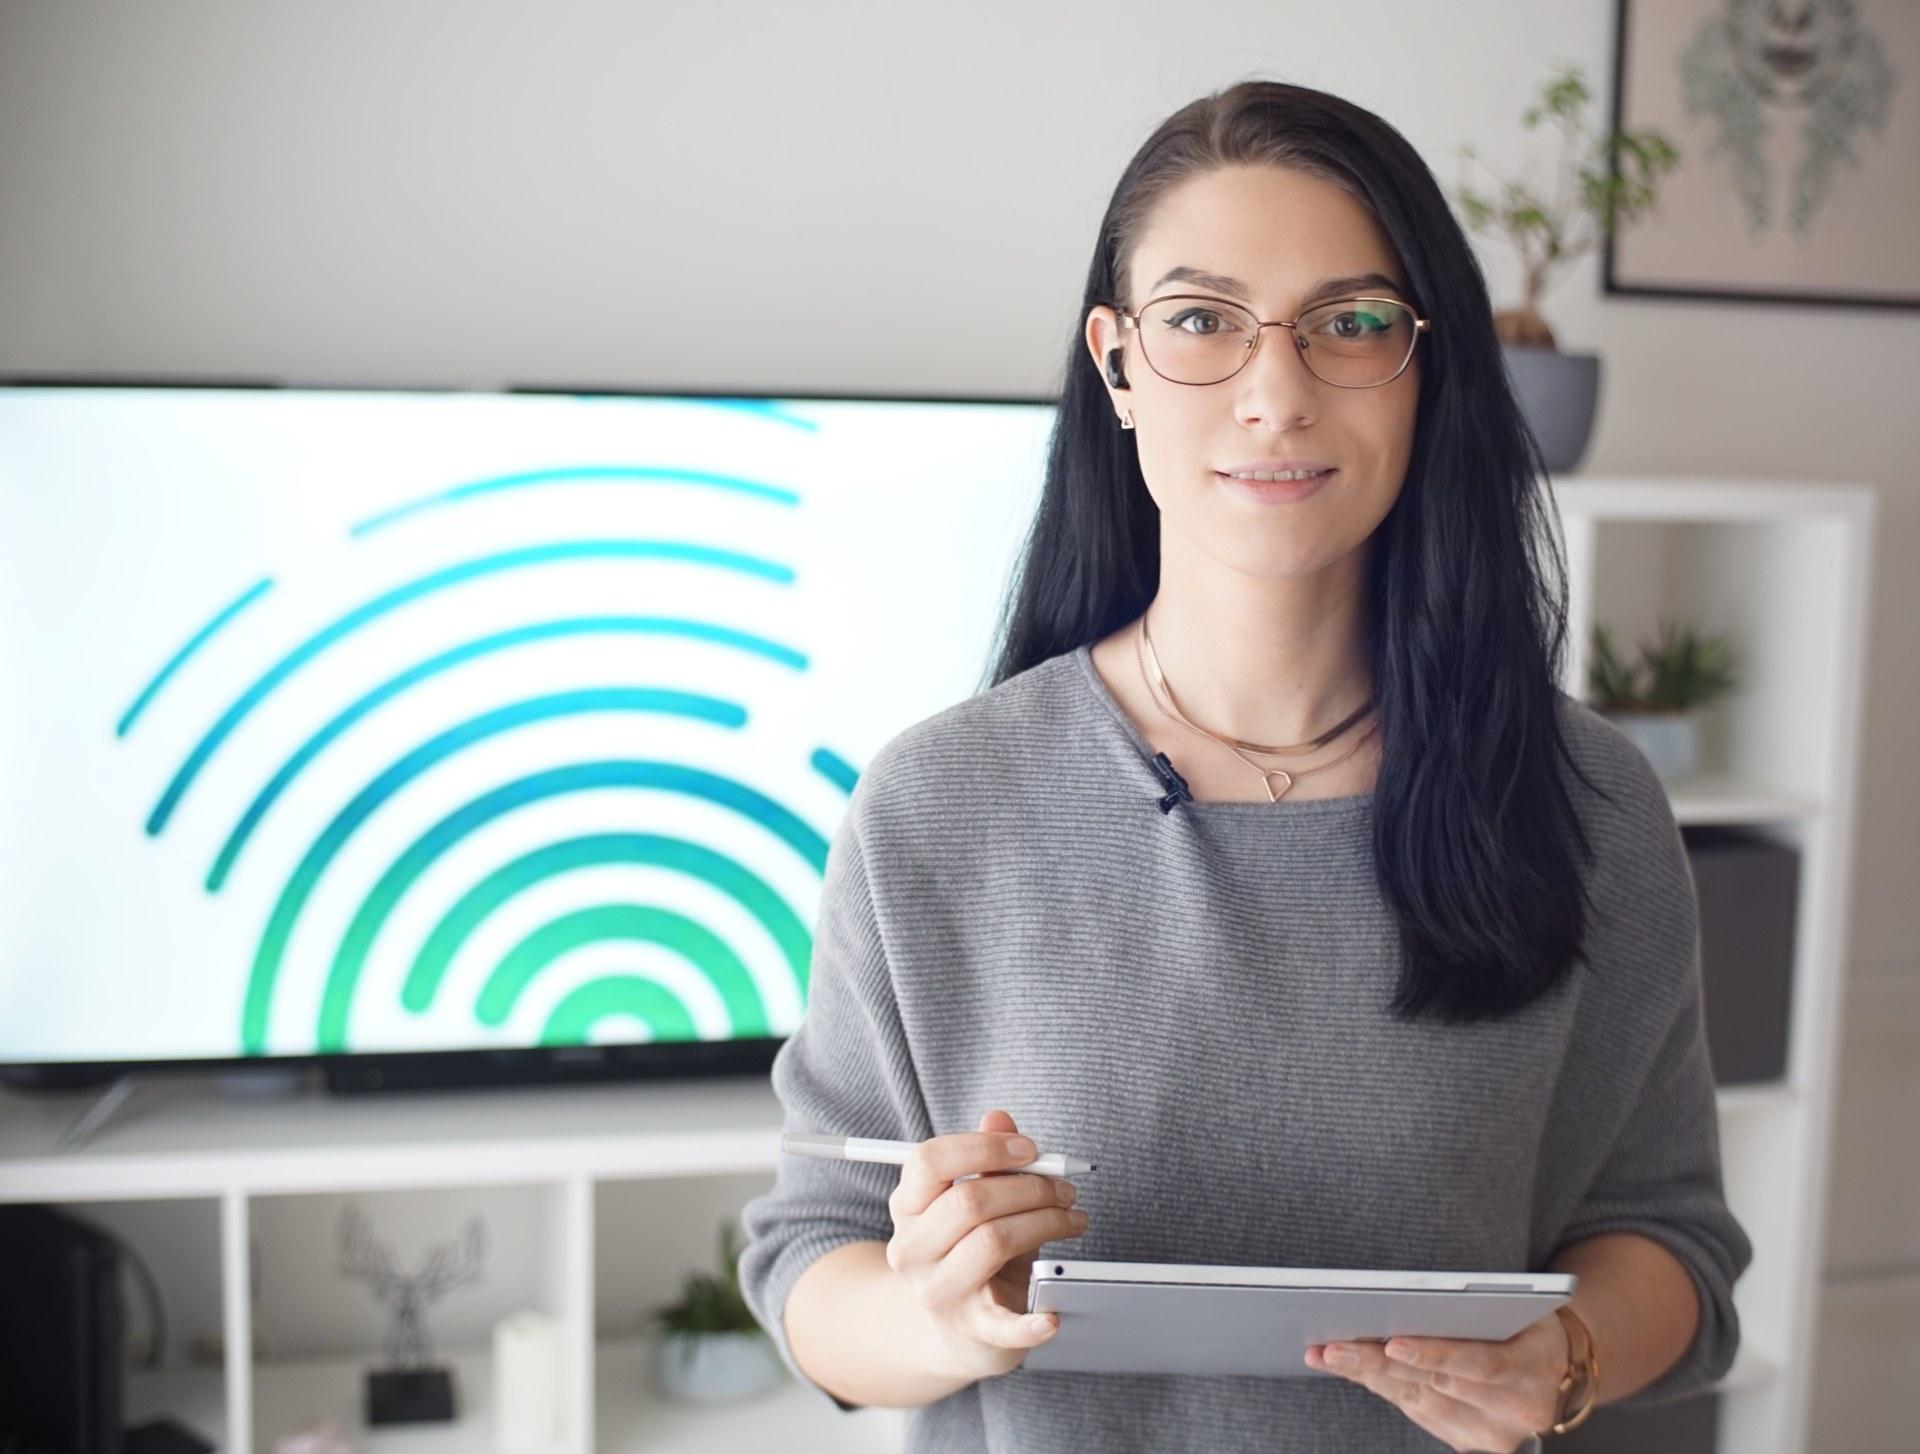 Janina Müller, M.Sc., (Hochschule Kaiserslautern) ist Ansprechpartnerin für das Atelier de Transfert